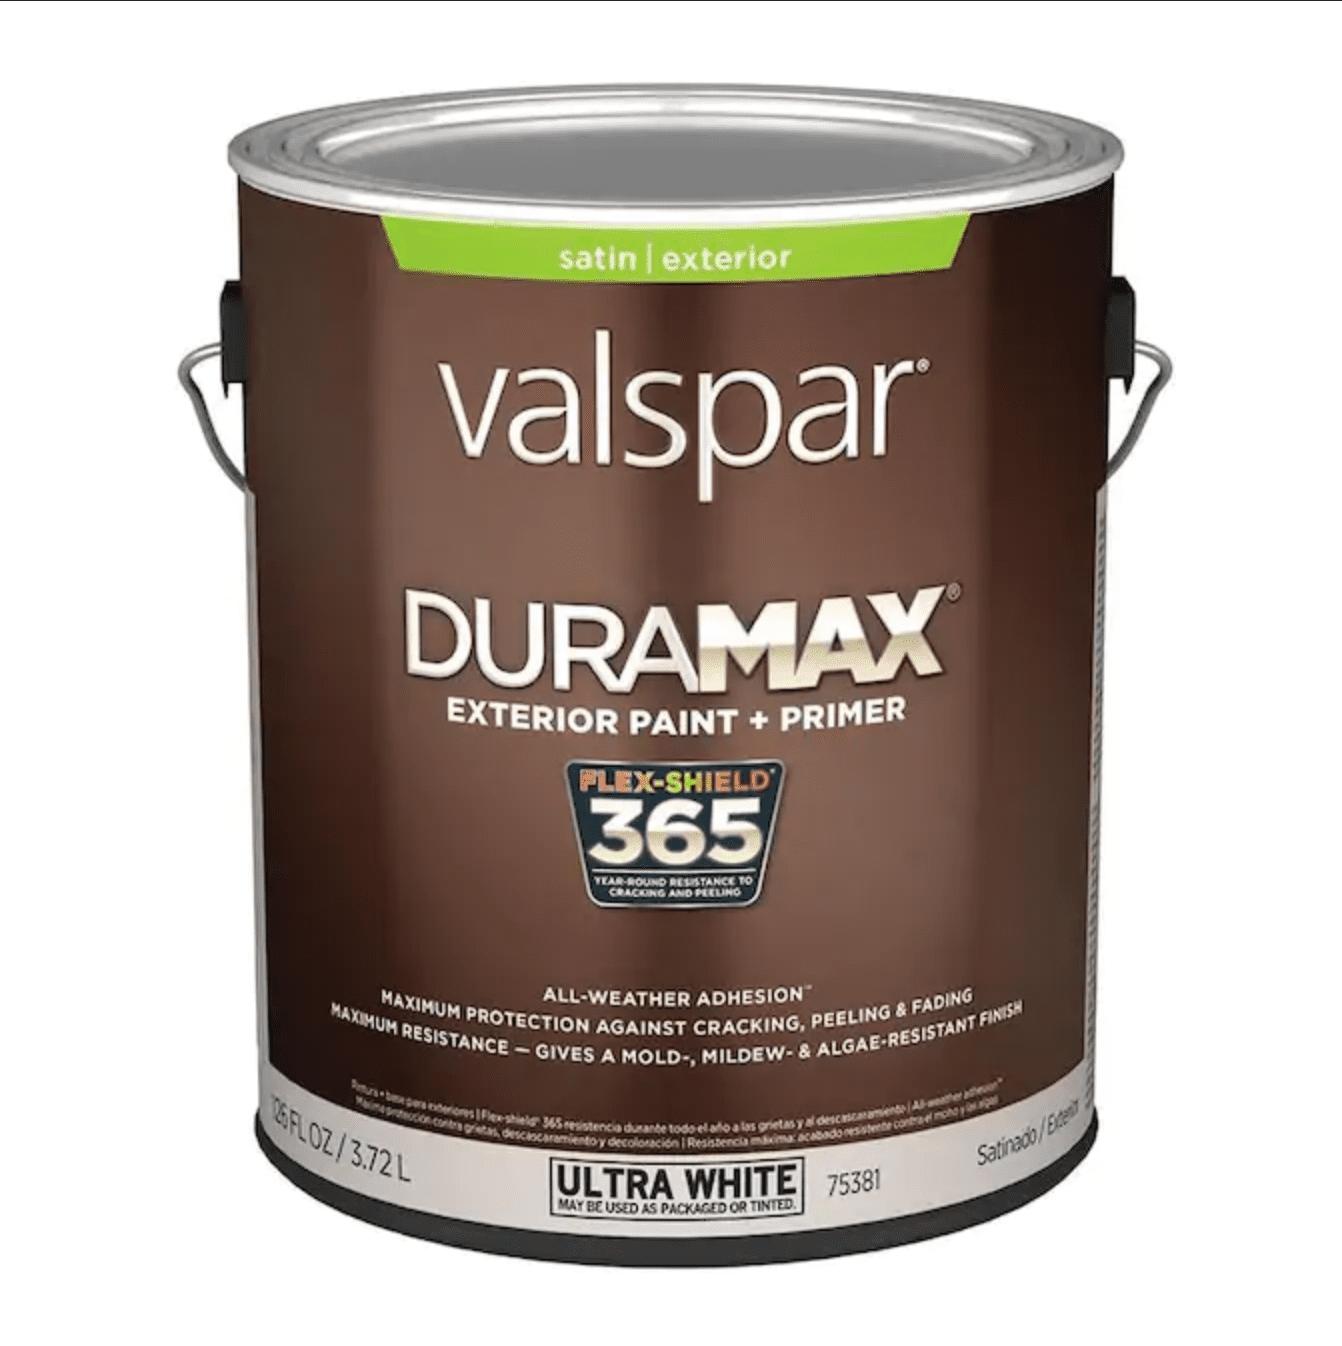 Valspar Duramax Base 1 Satin Exterior Tintable Paint